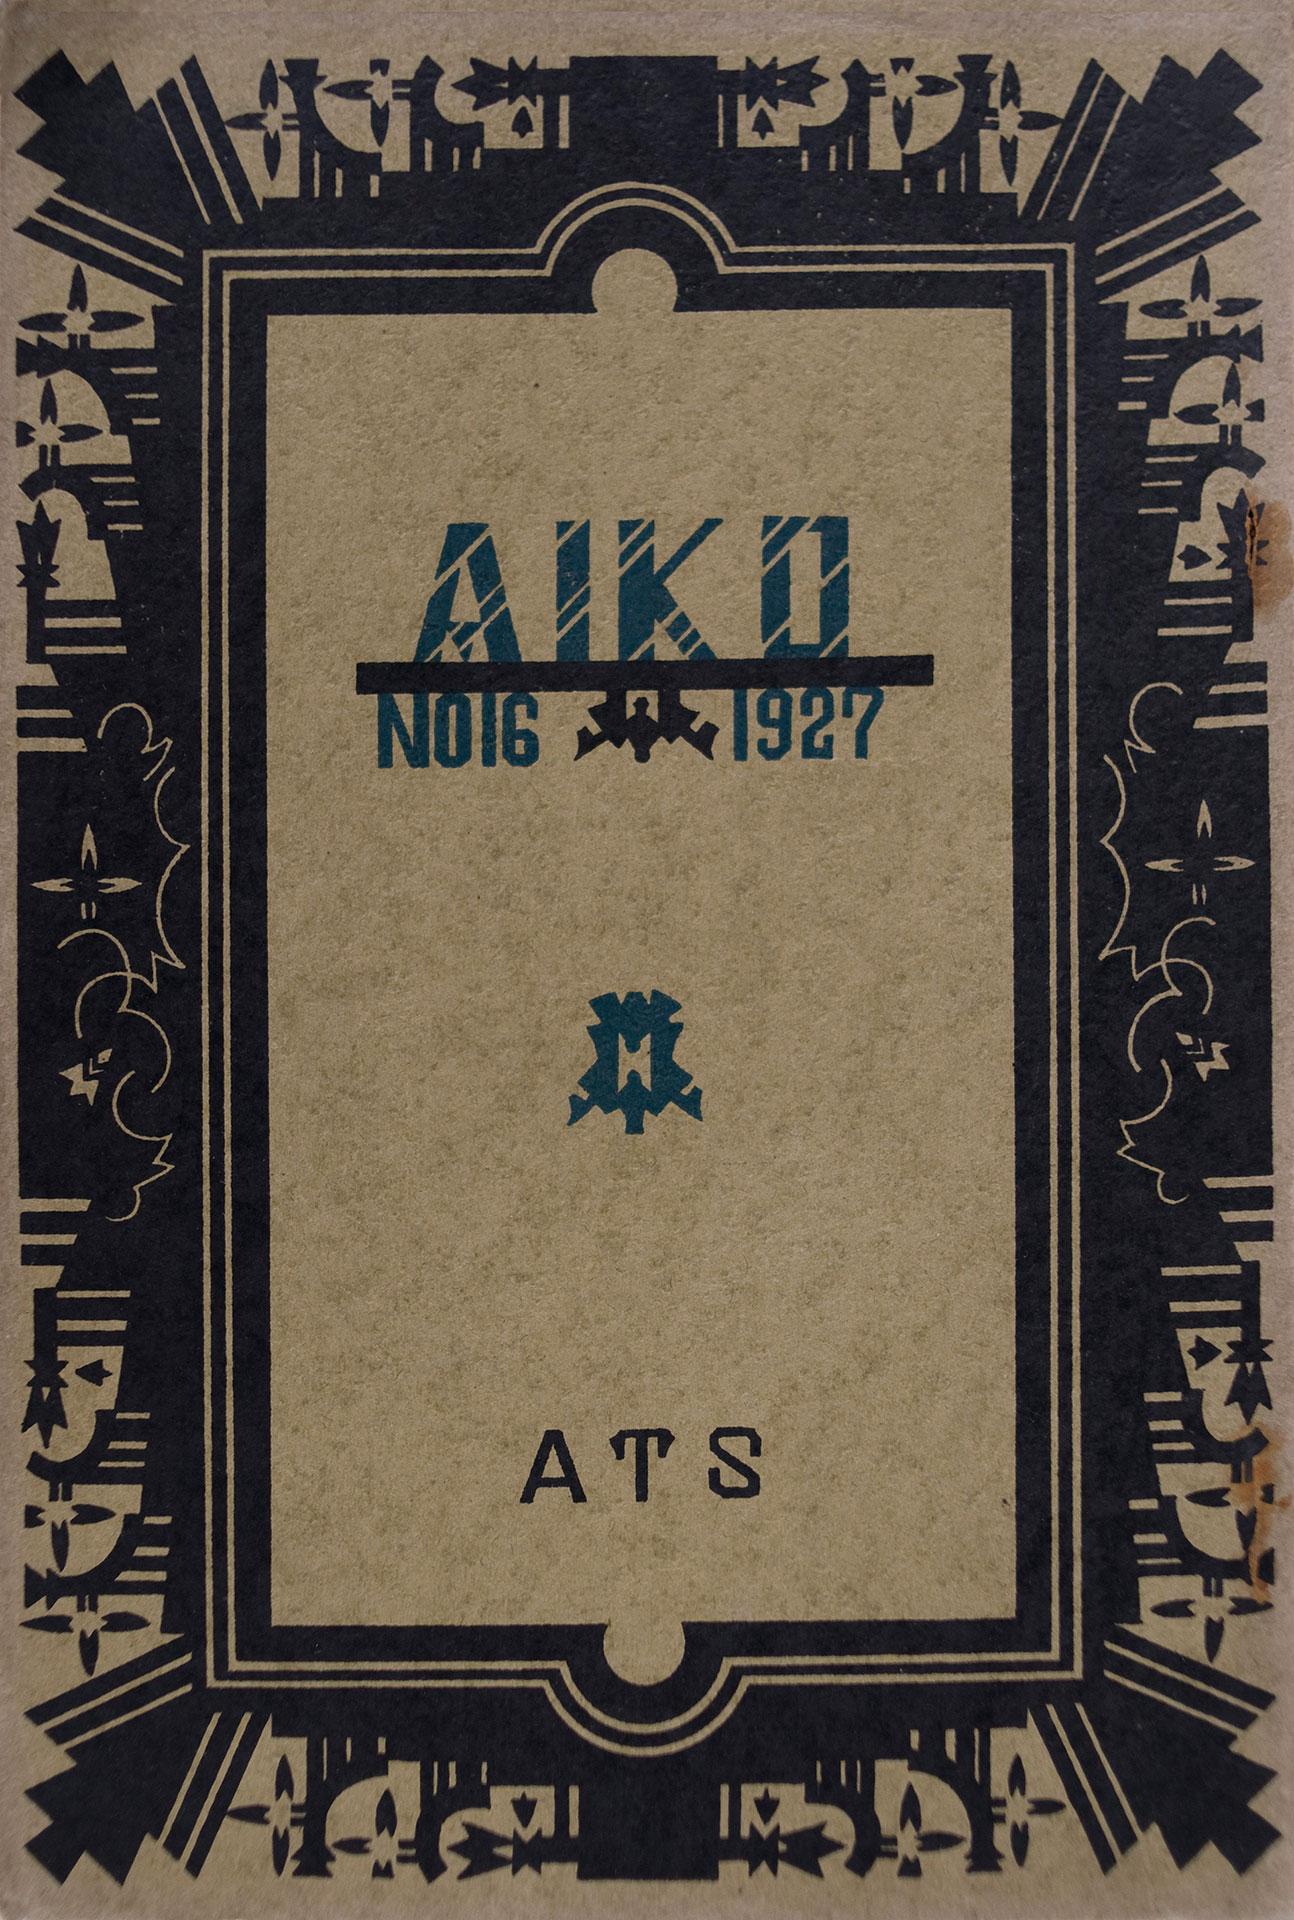 愛工 第拾六號 表紙 - Cover of School Magazine 'Aiko 16'